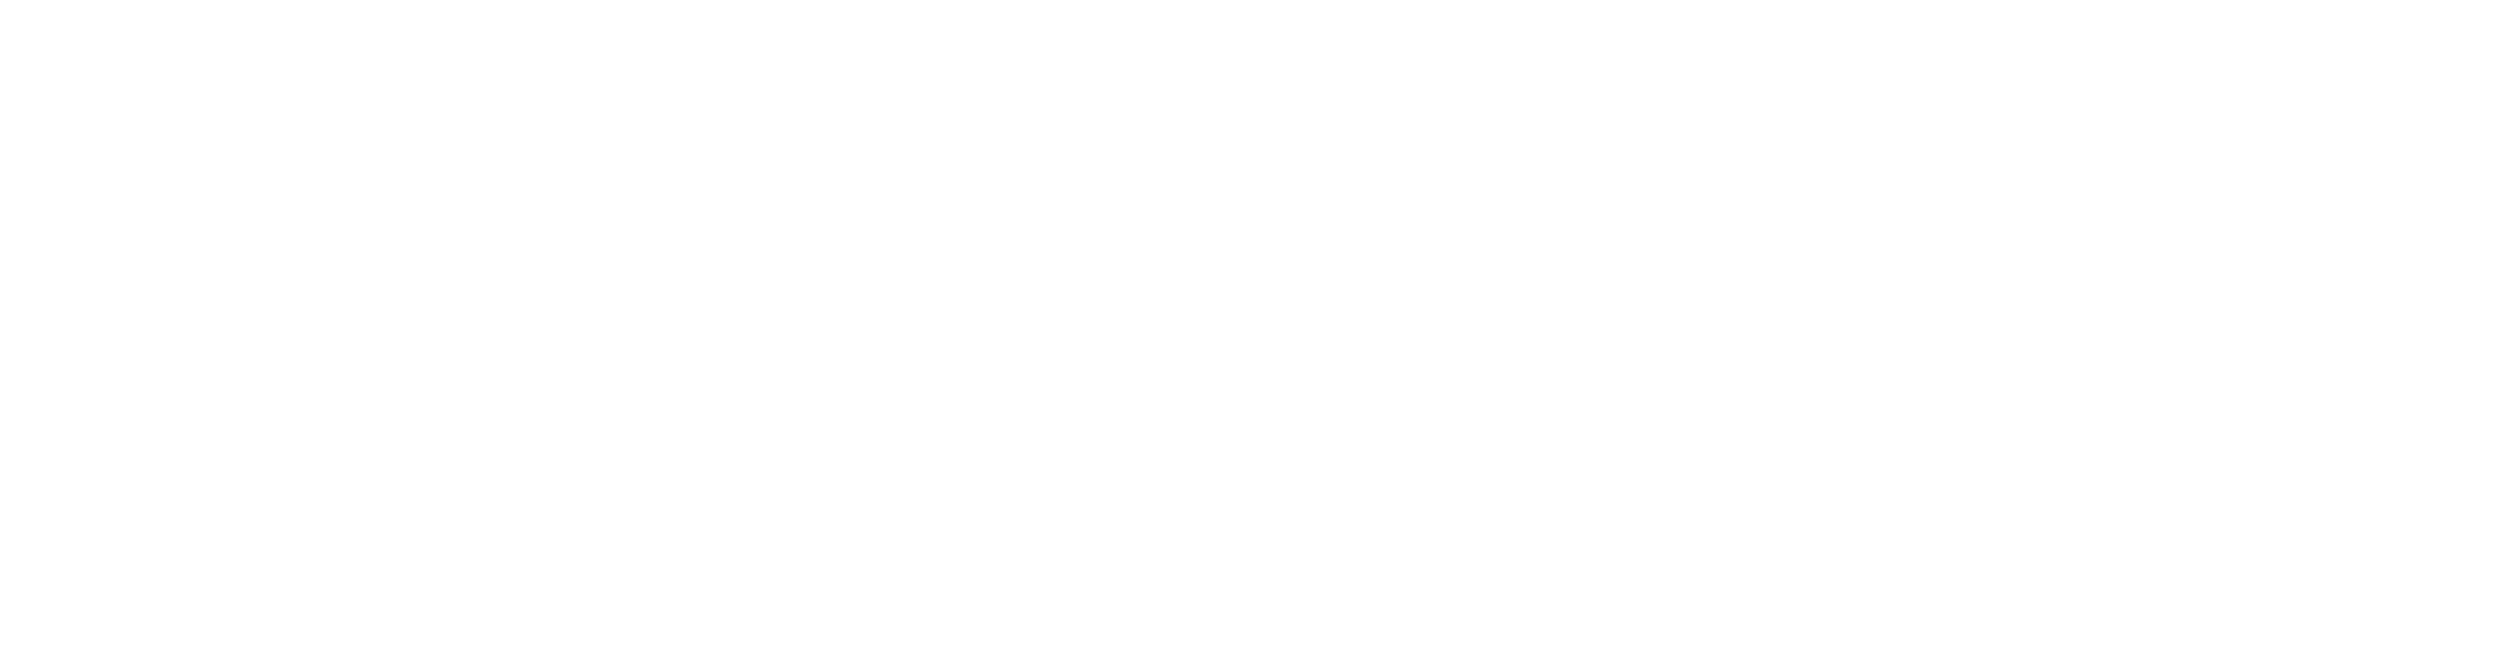 2018_Bontrager_logo_white_BikeSchool_Zermatt.png